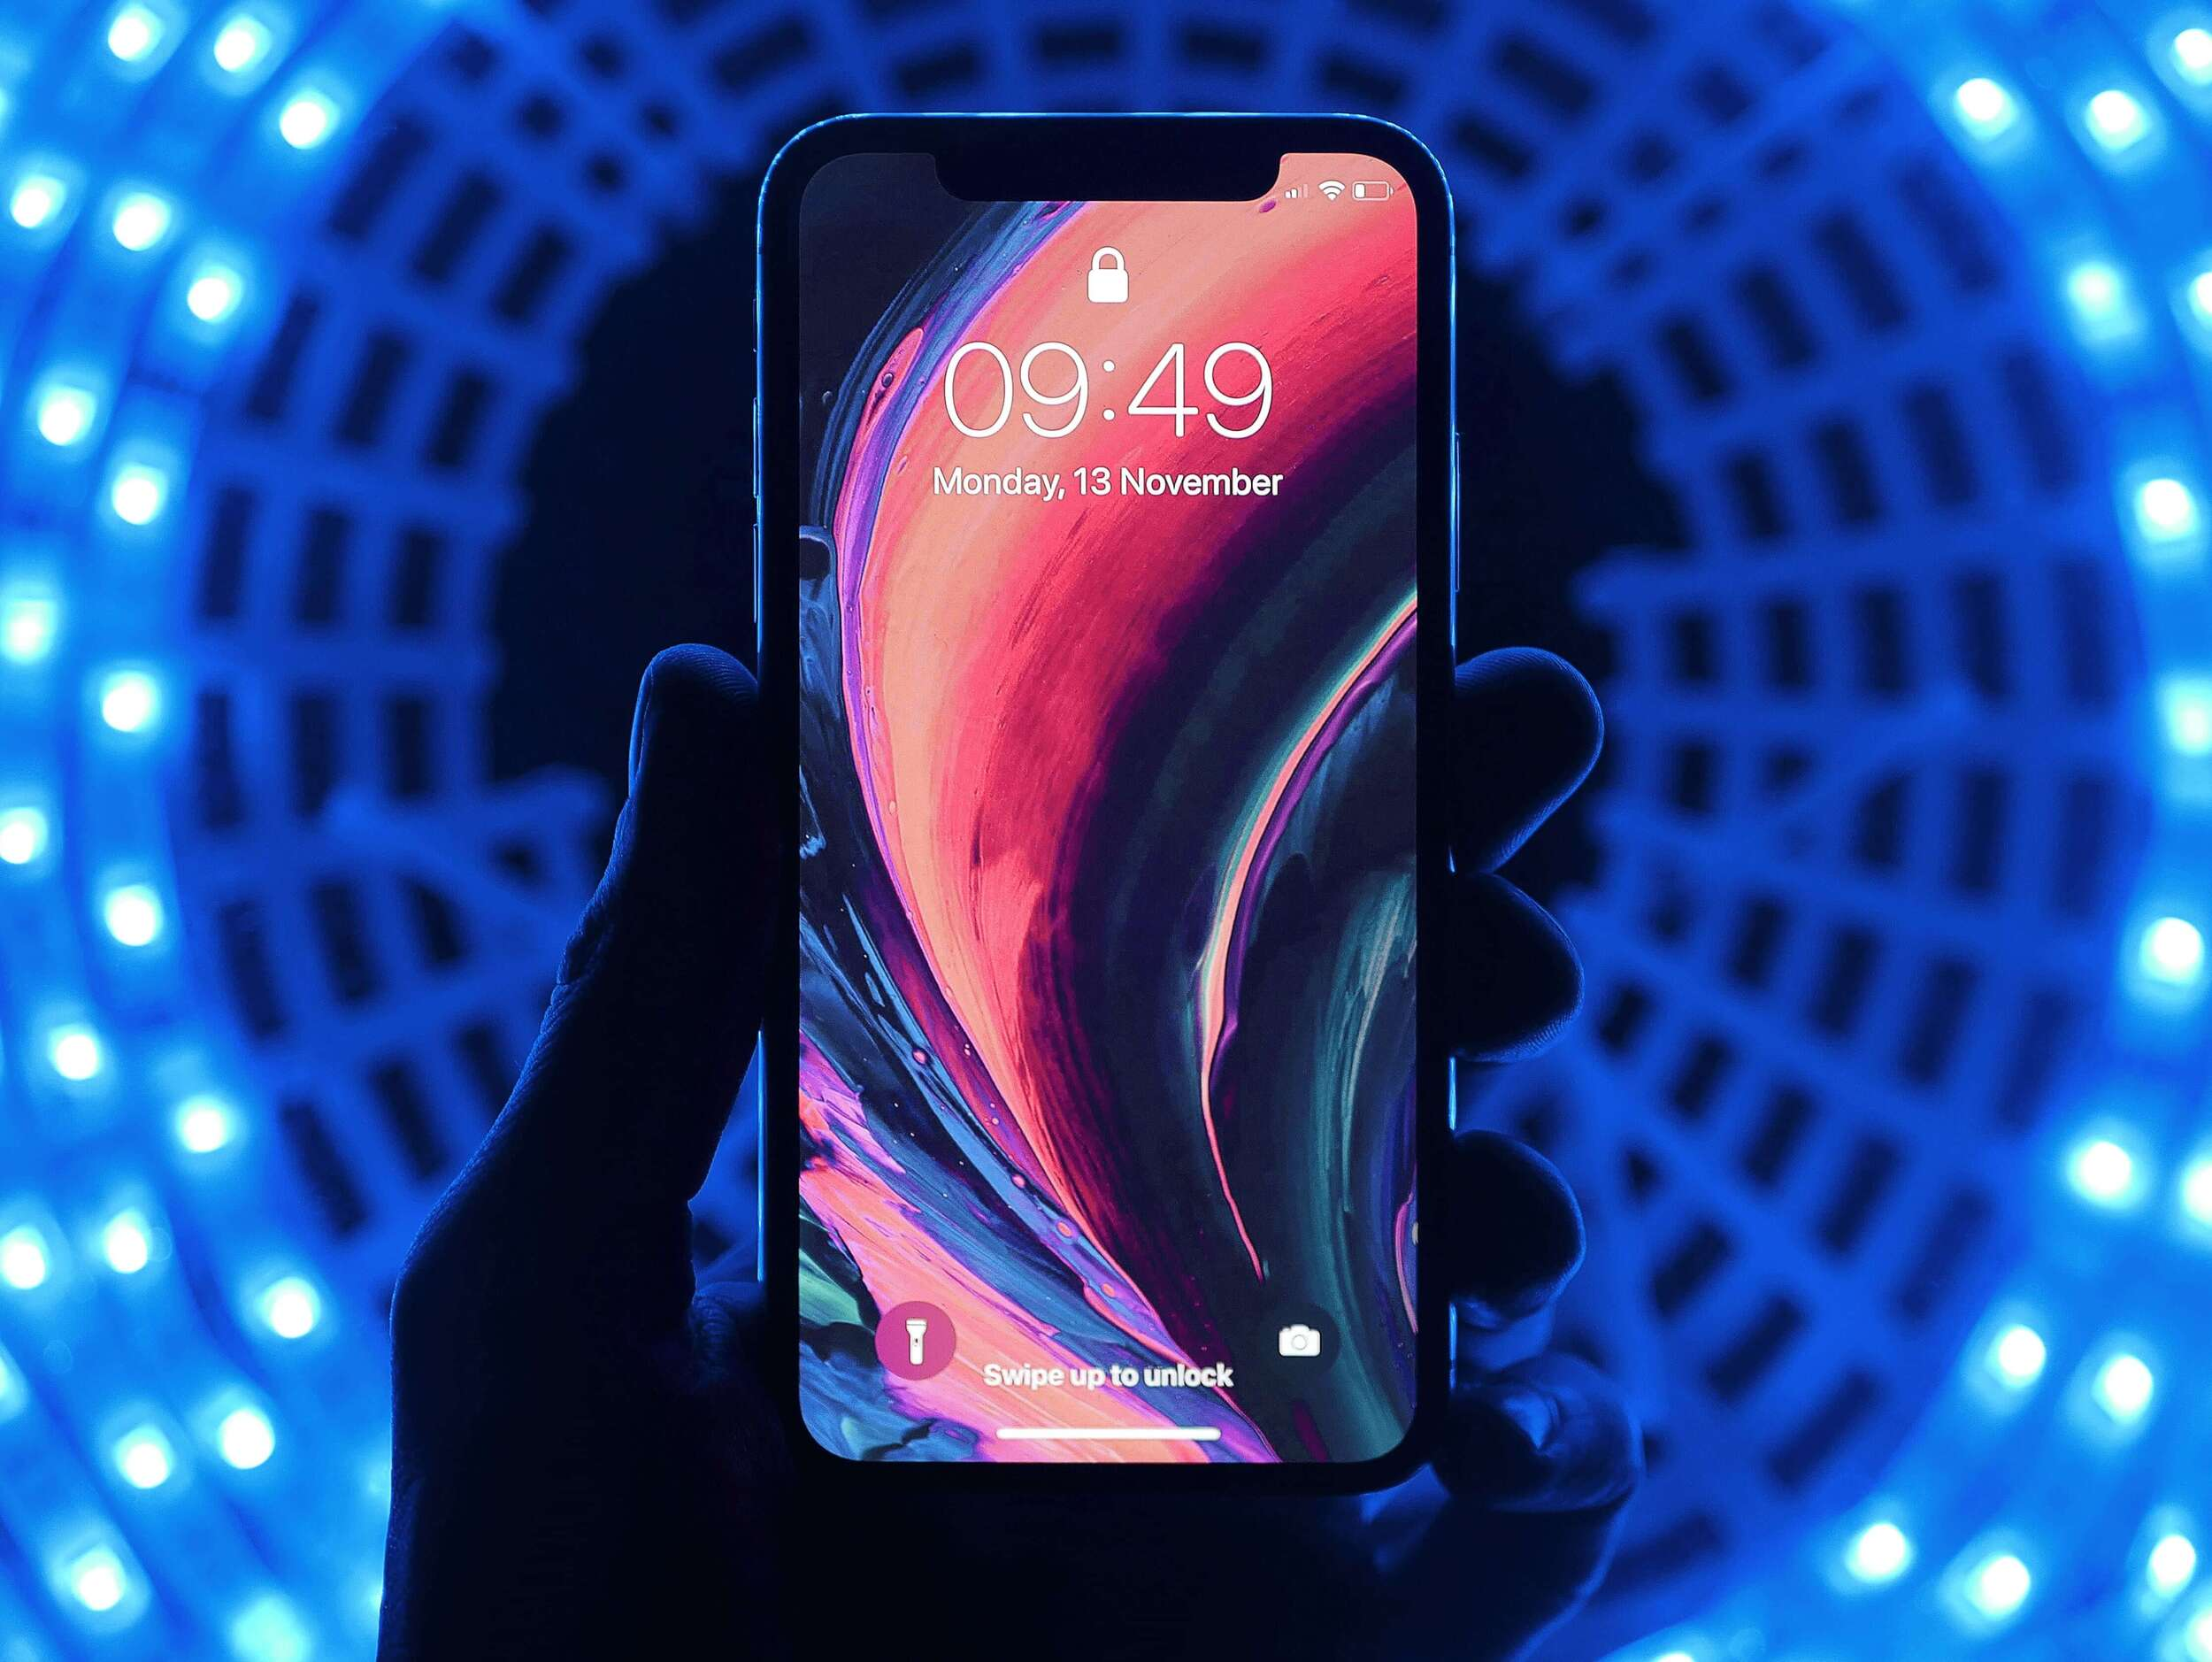 iphone spy apps jailbreak